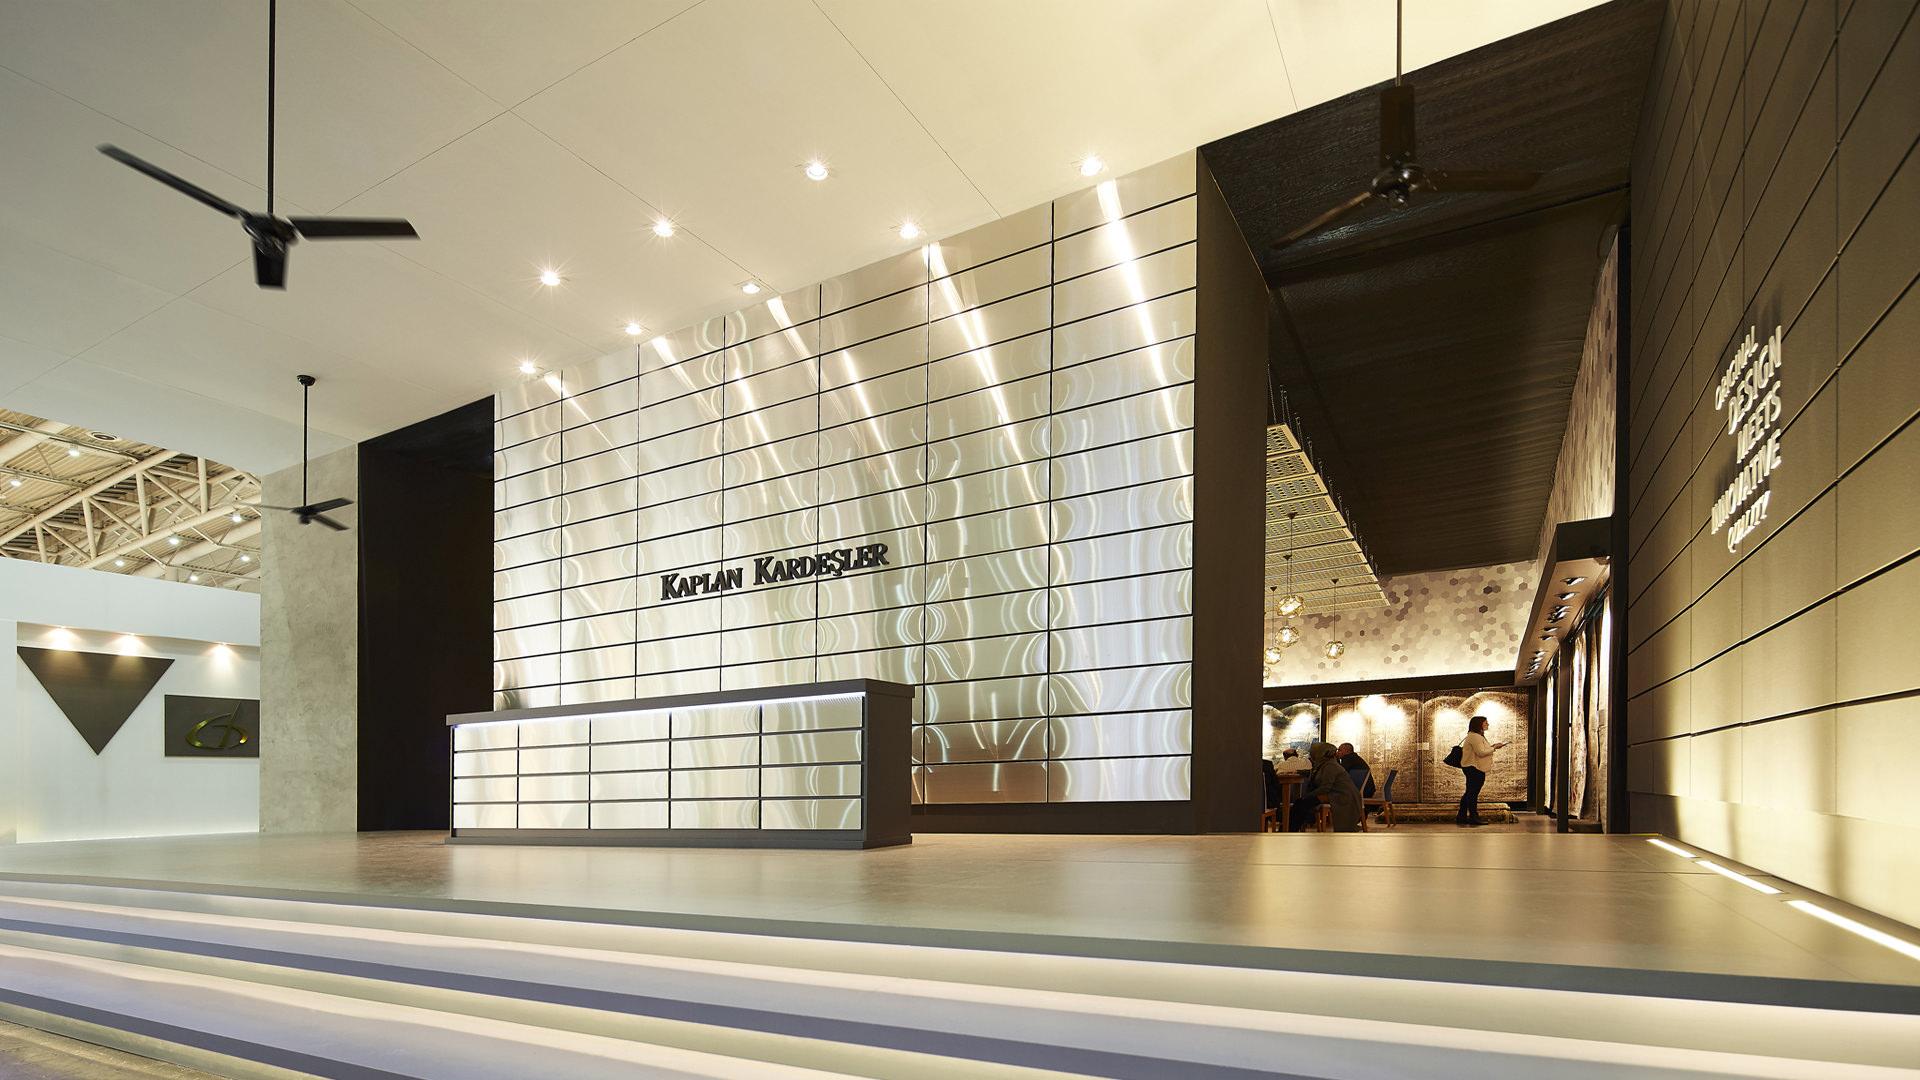 Hannover Kaplan Kardeşler Exhibition